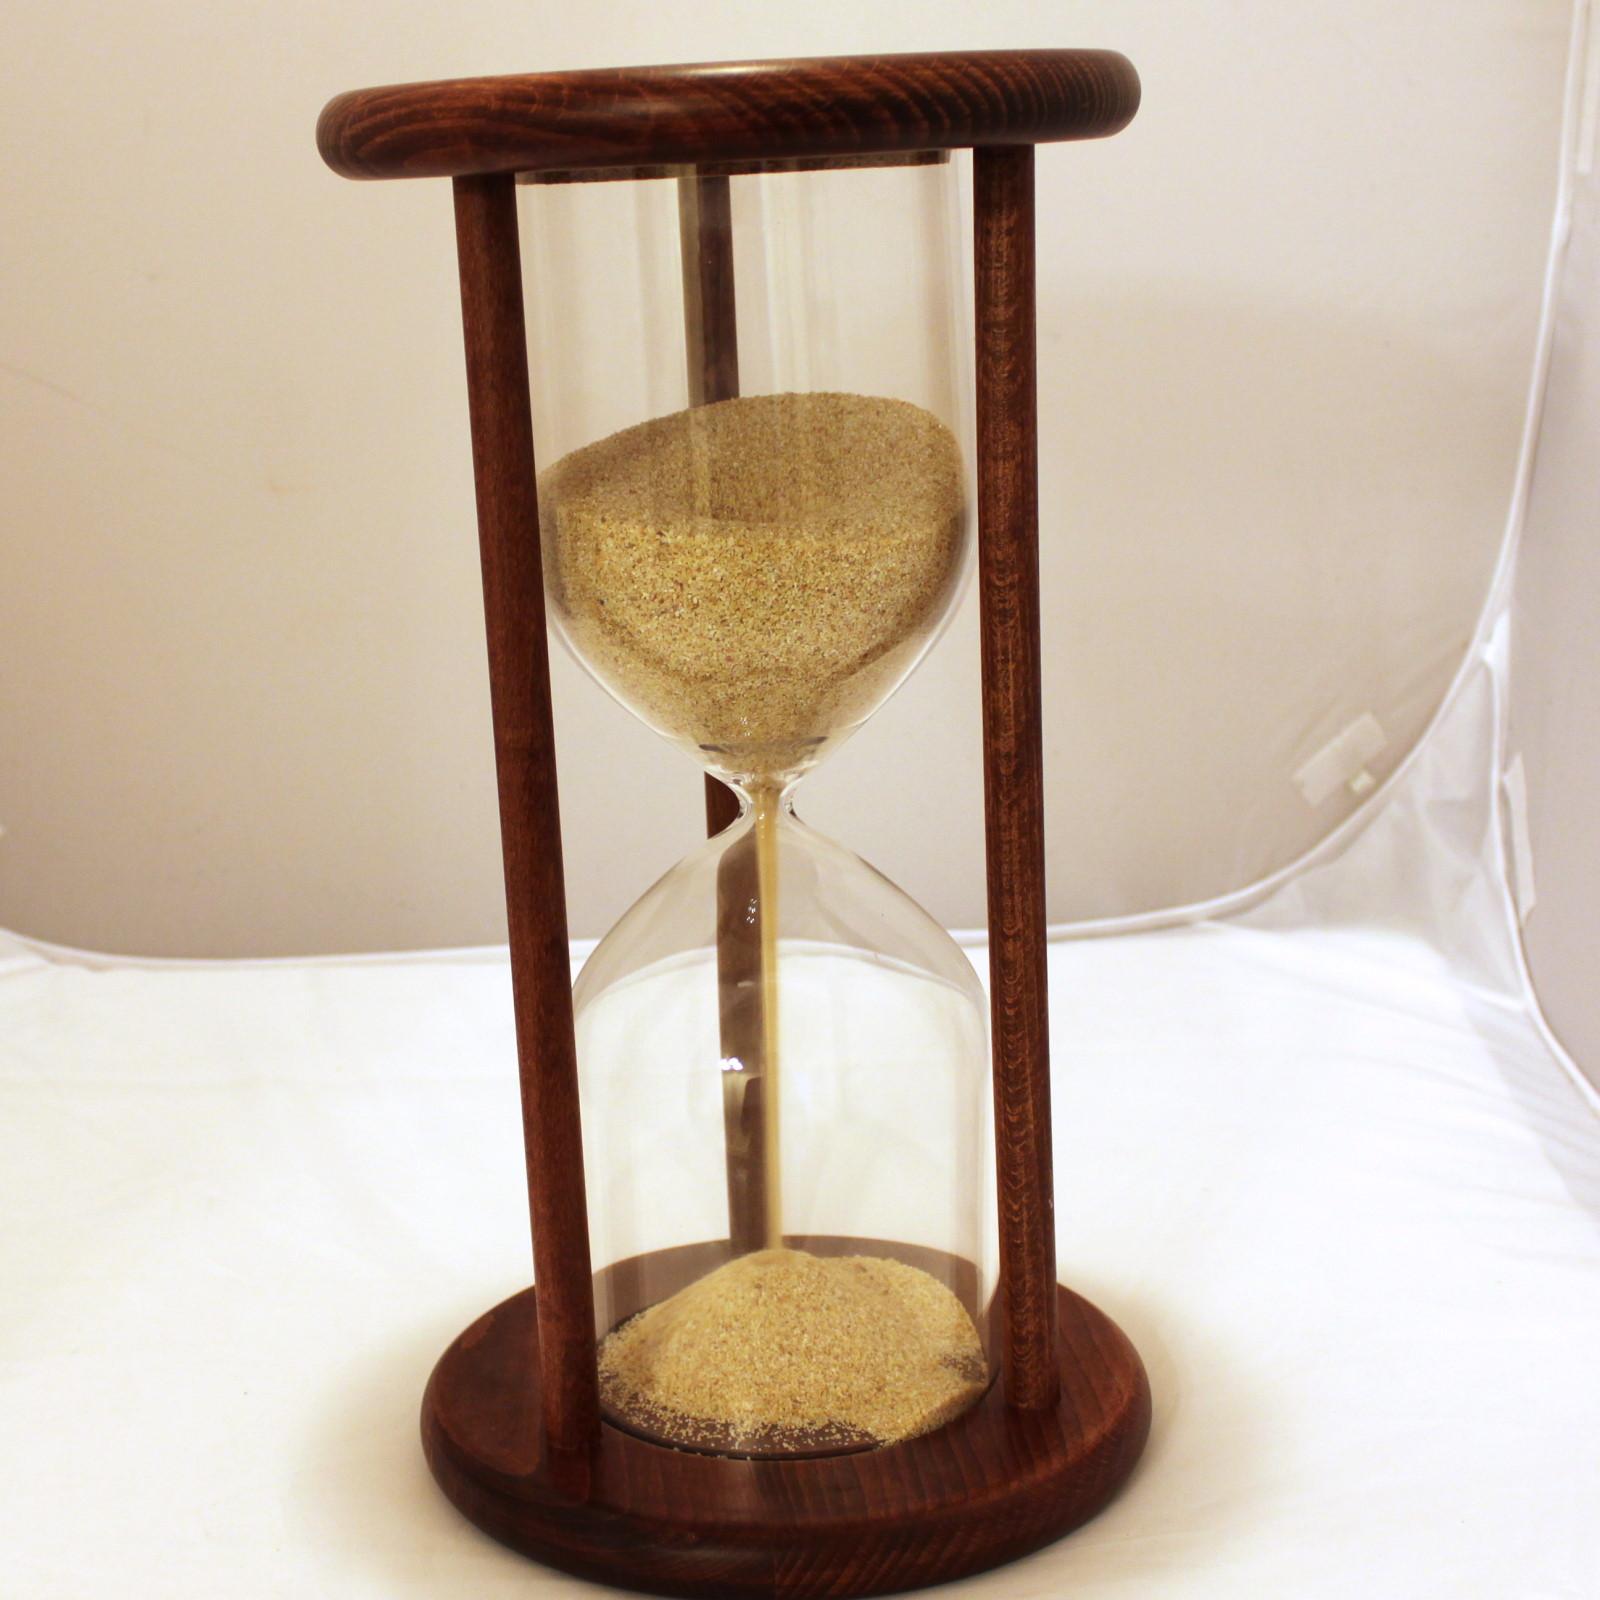 Time Is Money (Sagiv Levy) by Sagiv Levy